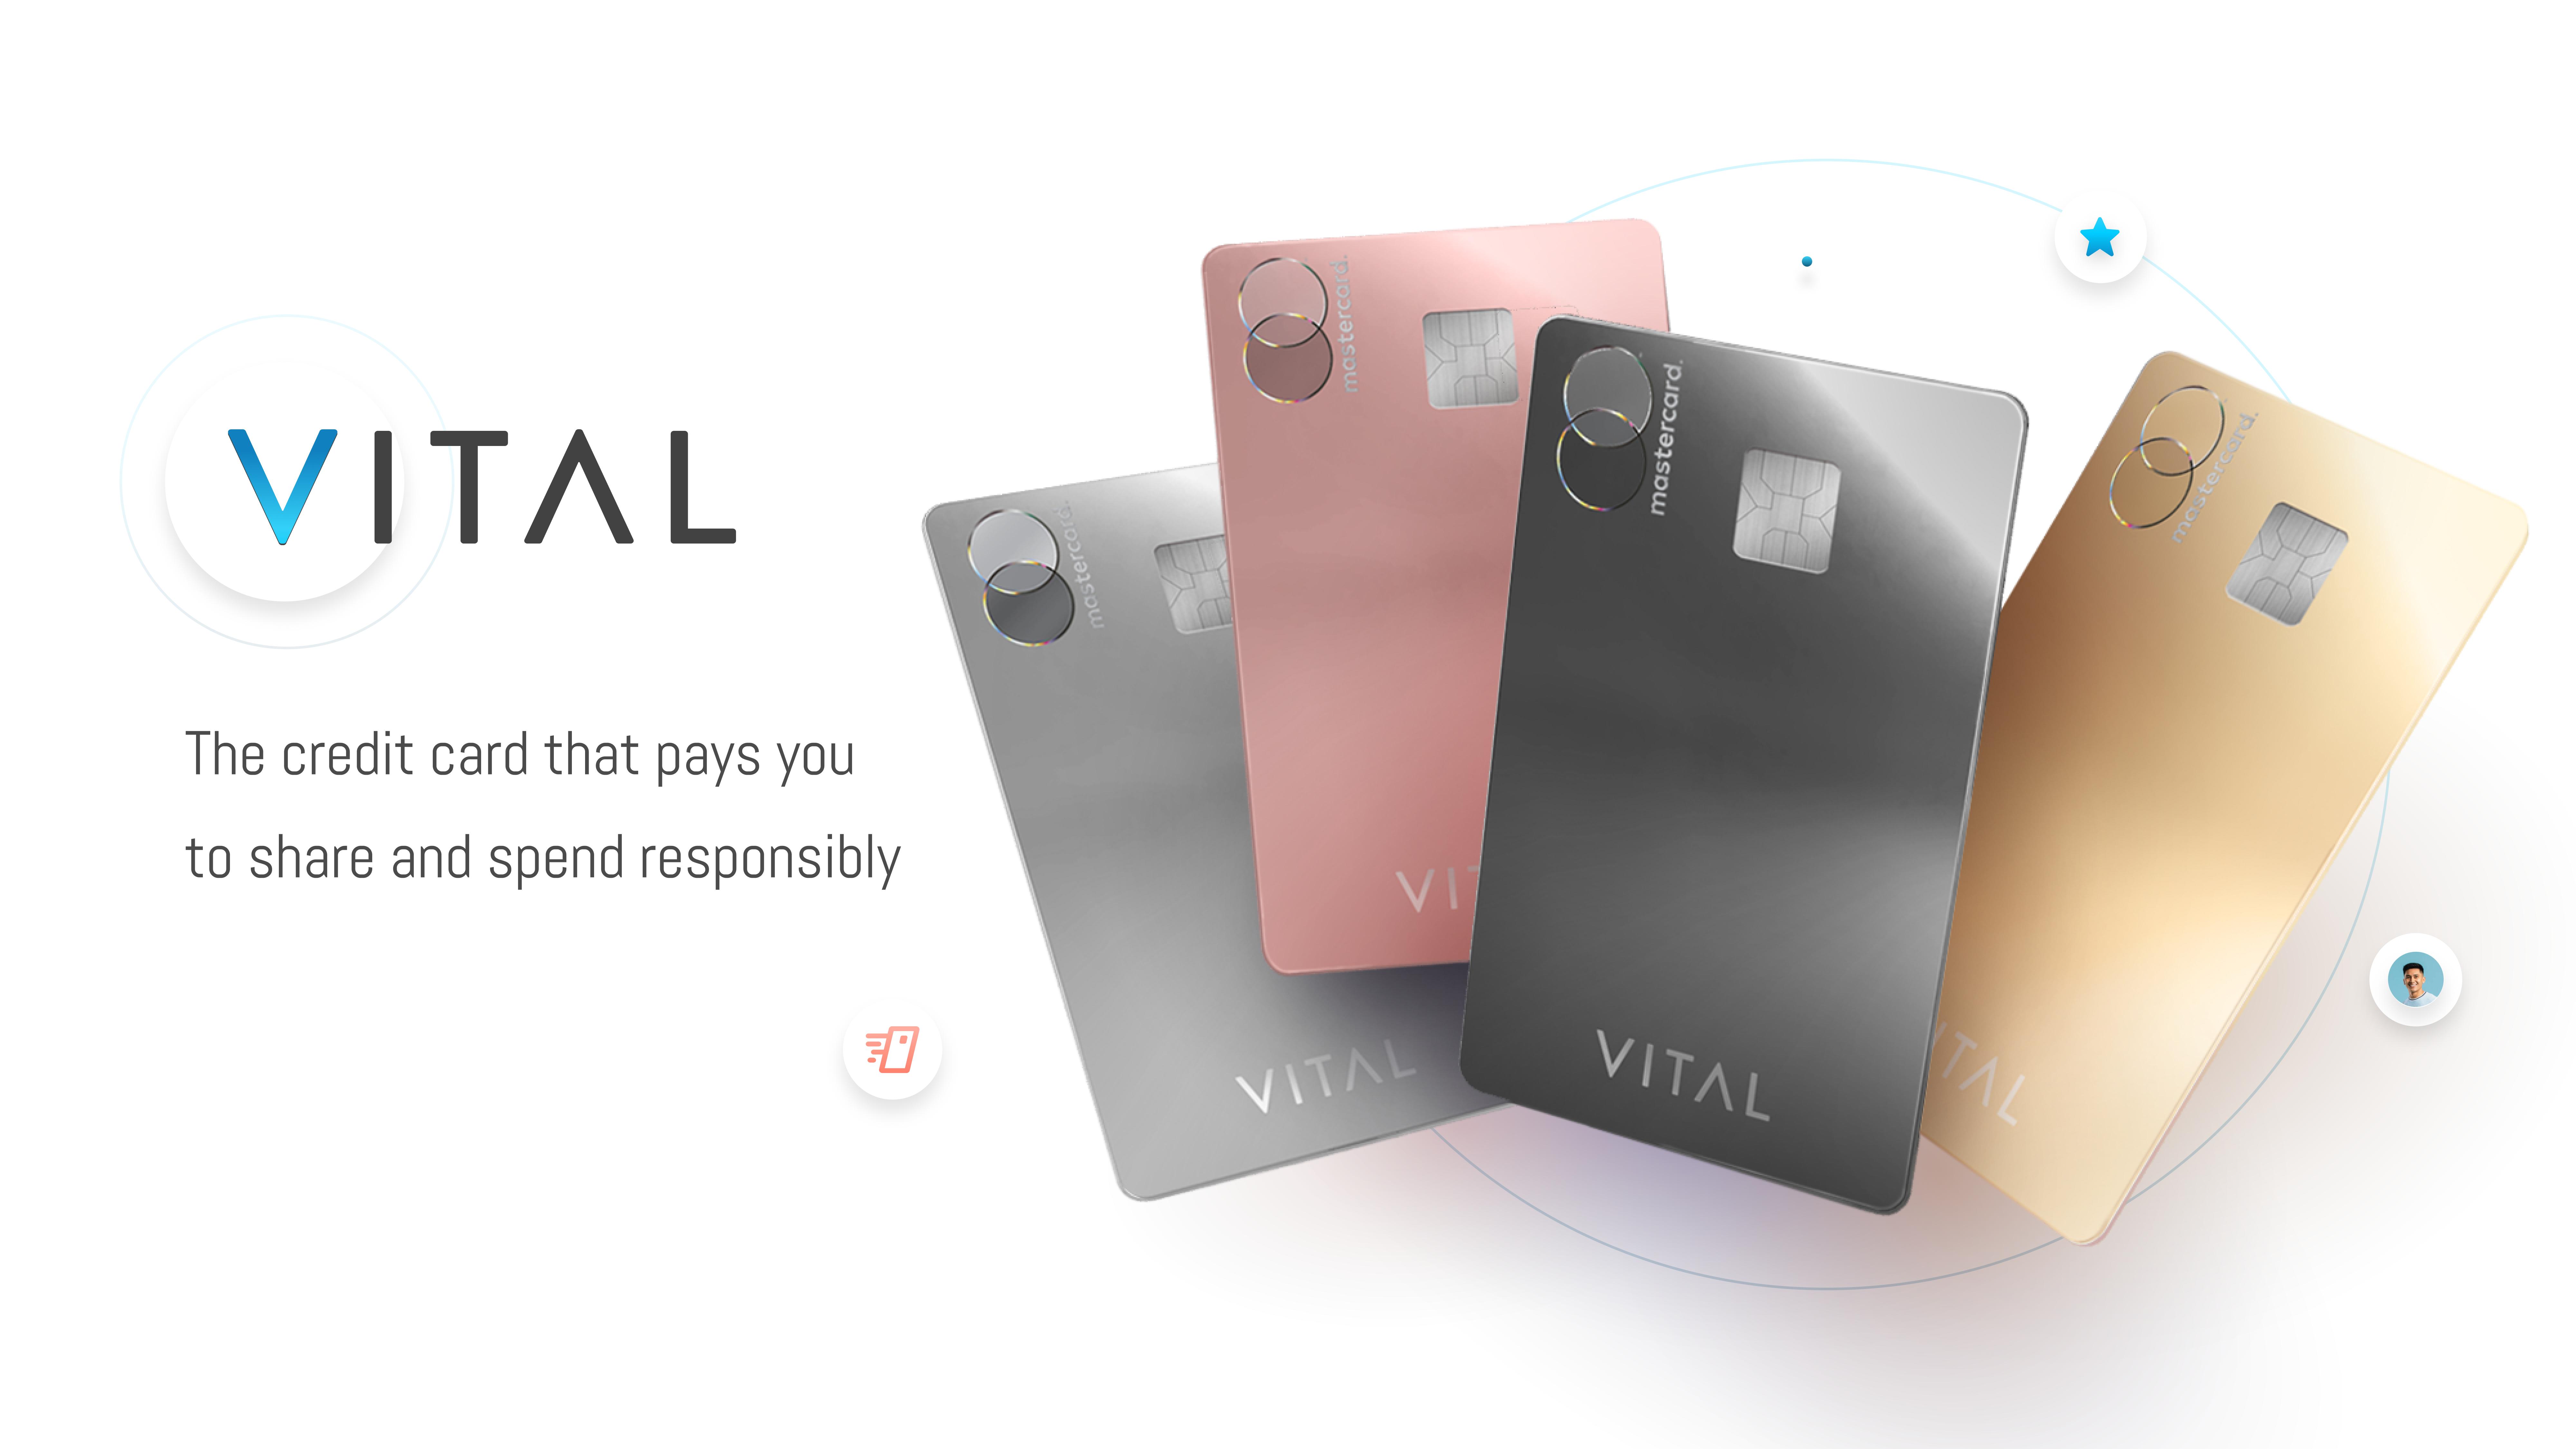 vitalcard